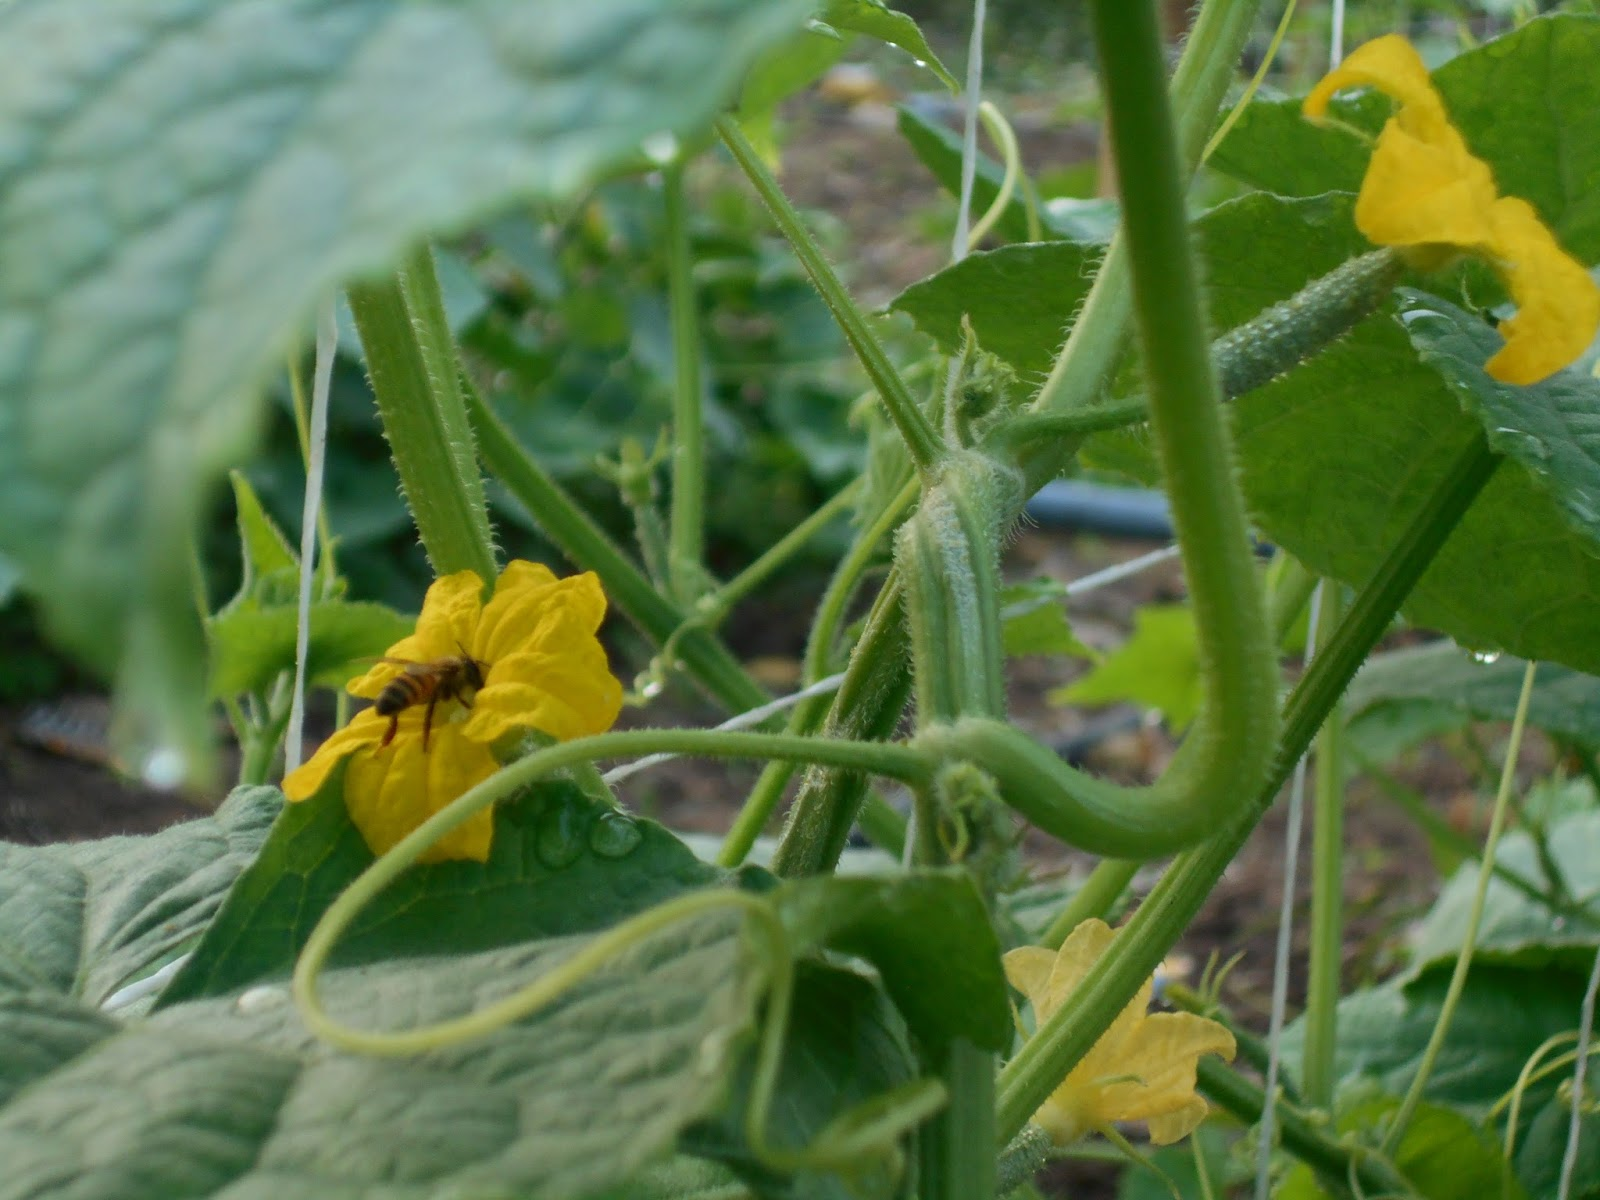 cucumber cultivation dictionary part 3 hybrid veggies